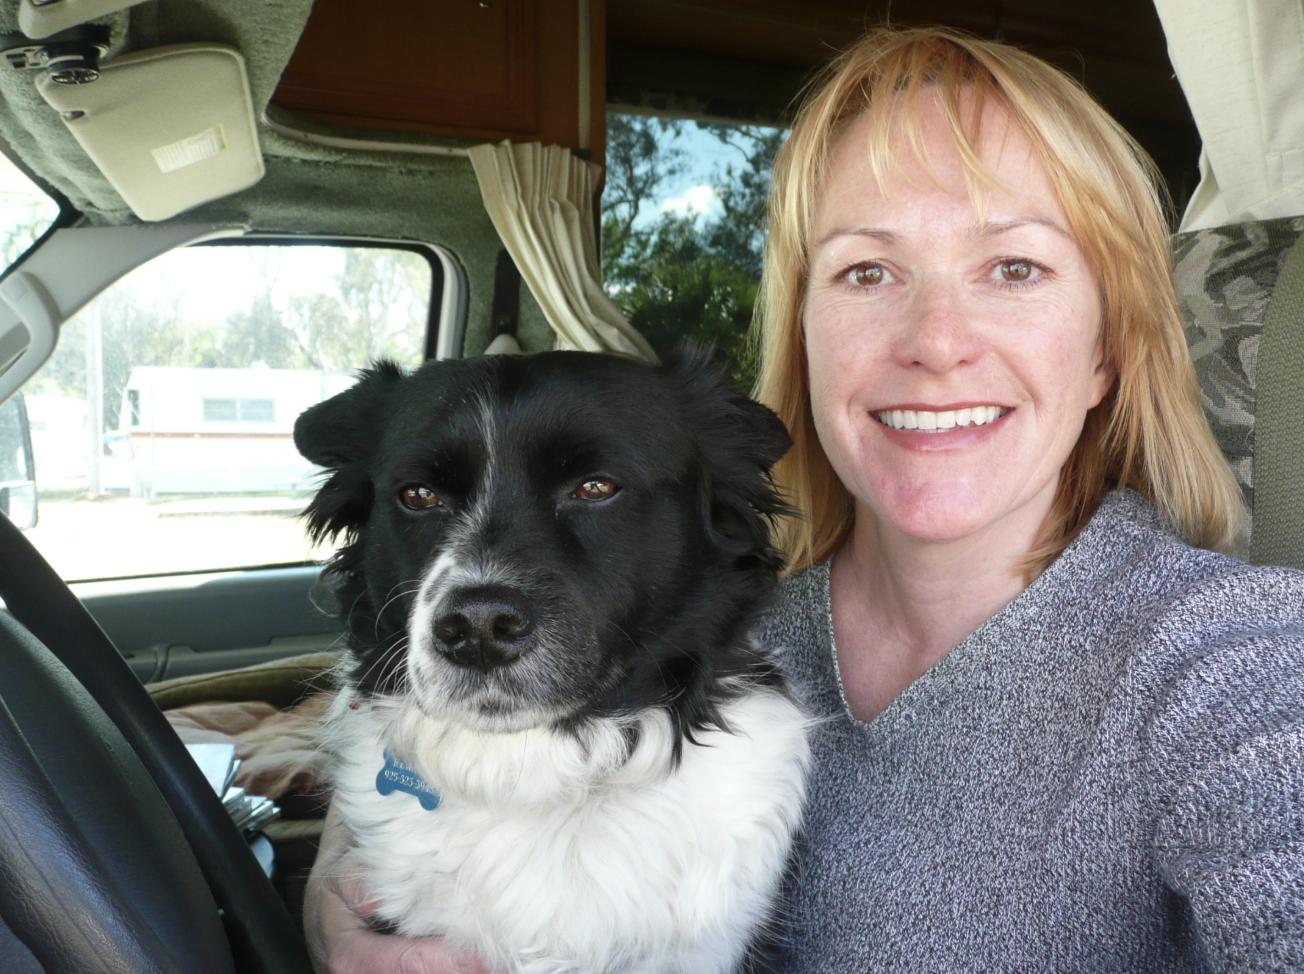 Confessions of a Middle-Aged Runaway An RV Travel Adventureby Heidi Eliason, retirement, motorhome travel, mid-life crisis